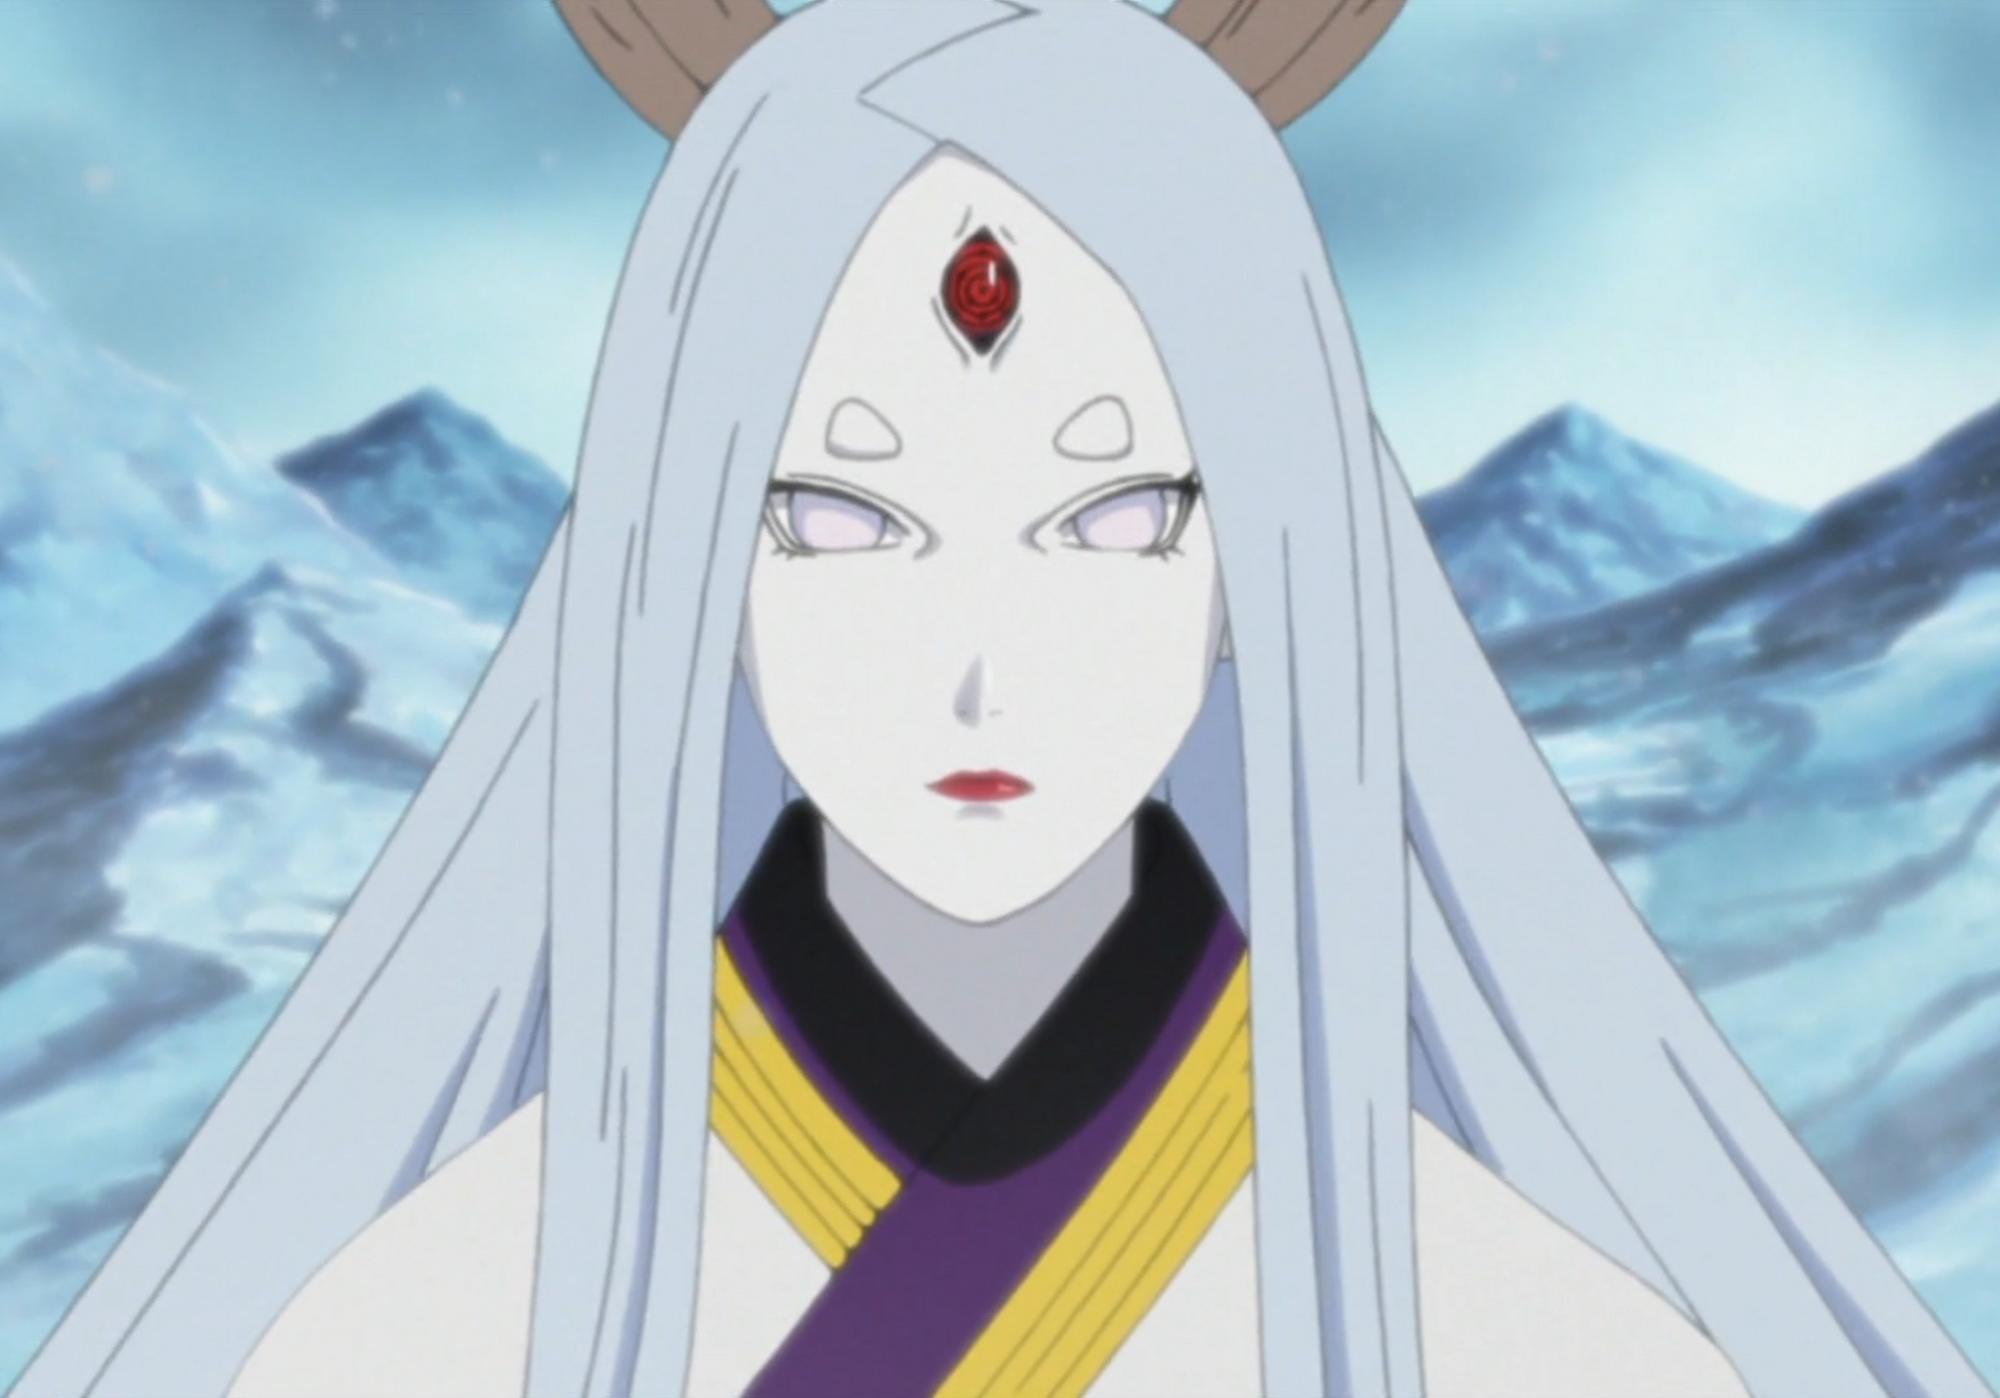 Kaguya Ōtsutsuki | Narutopedia | FANDOM powered by Wikia